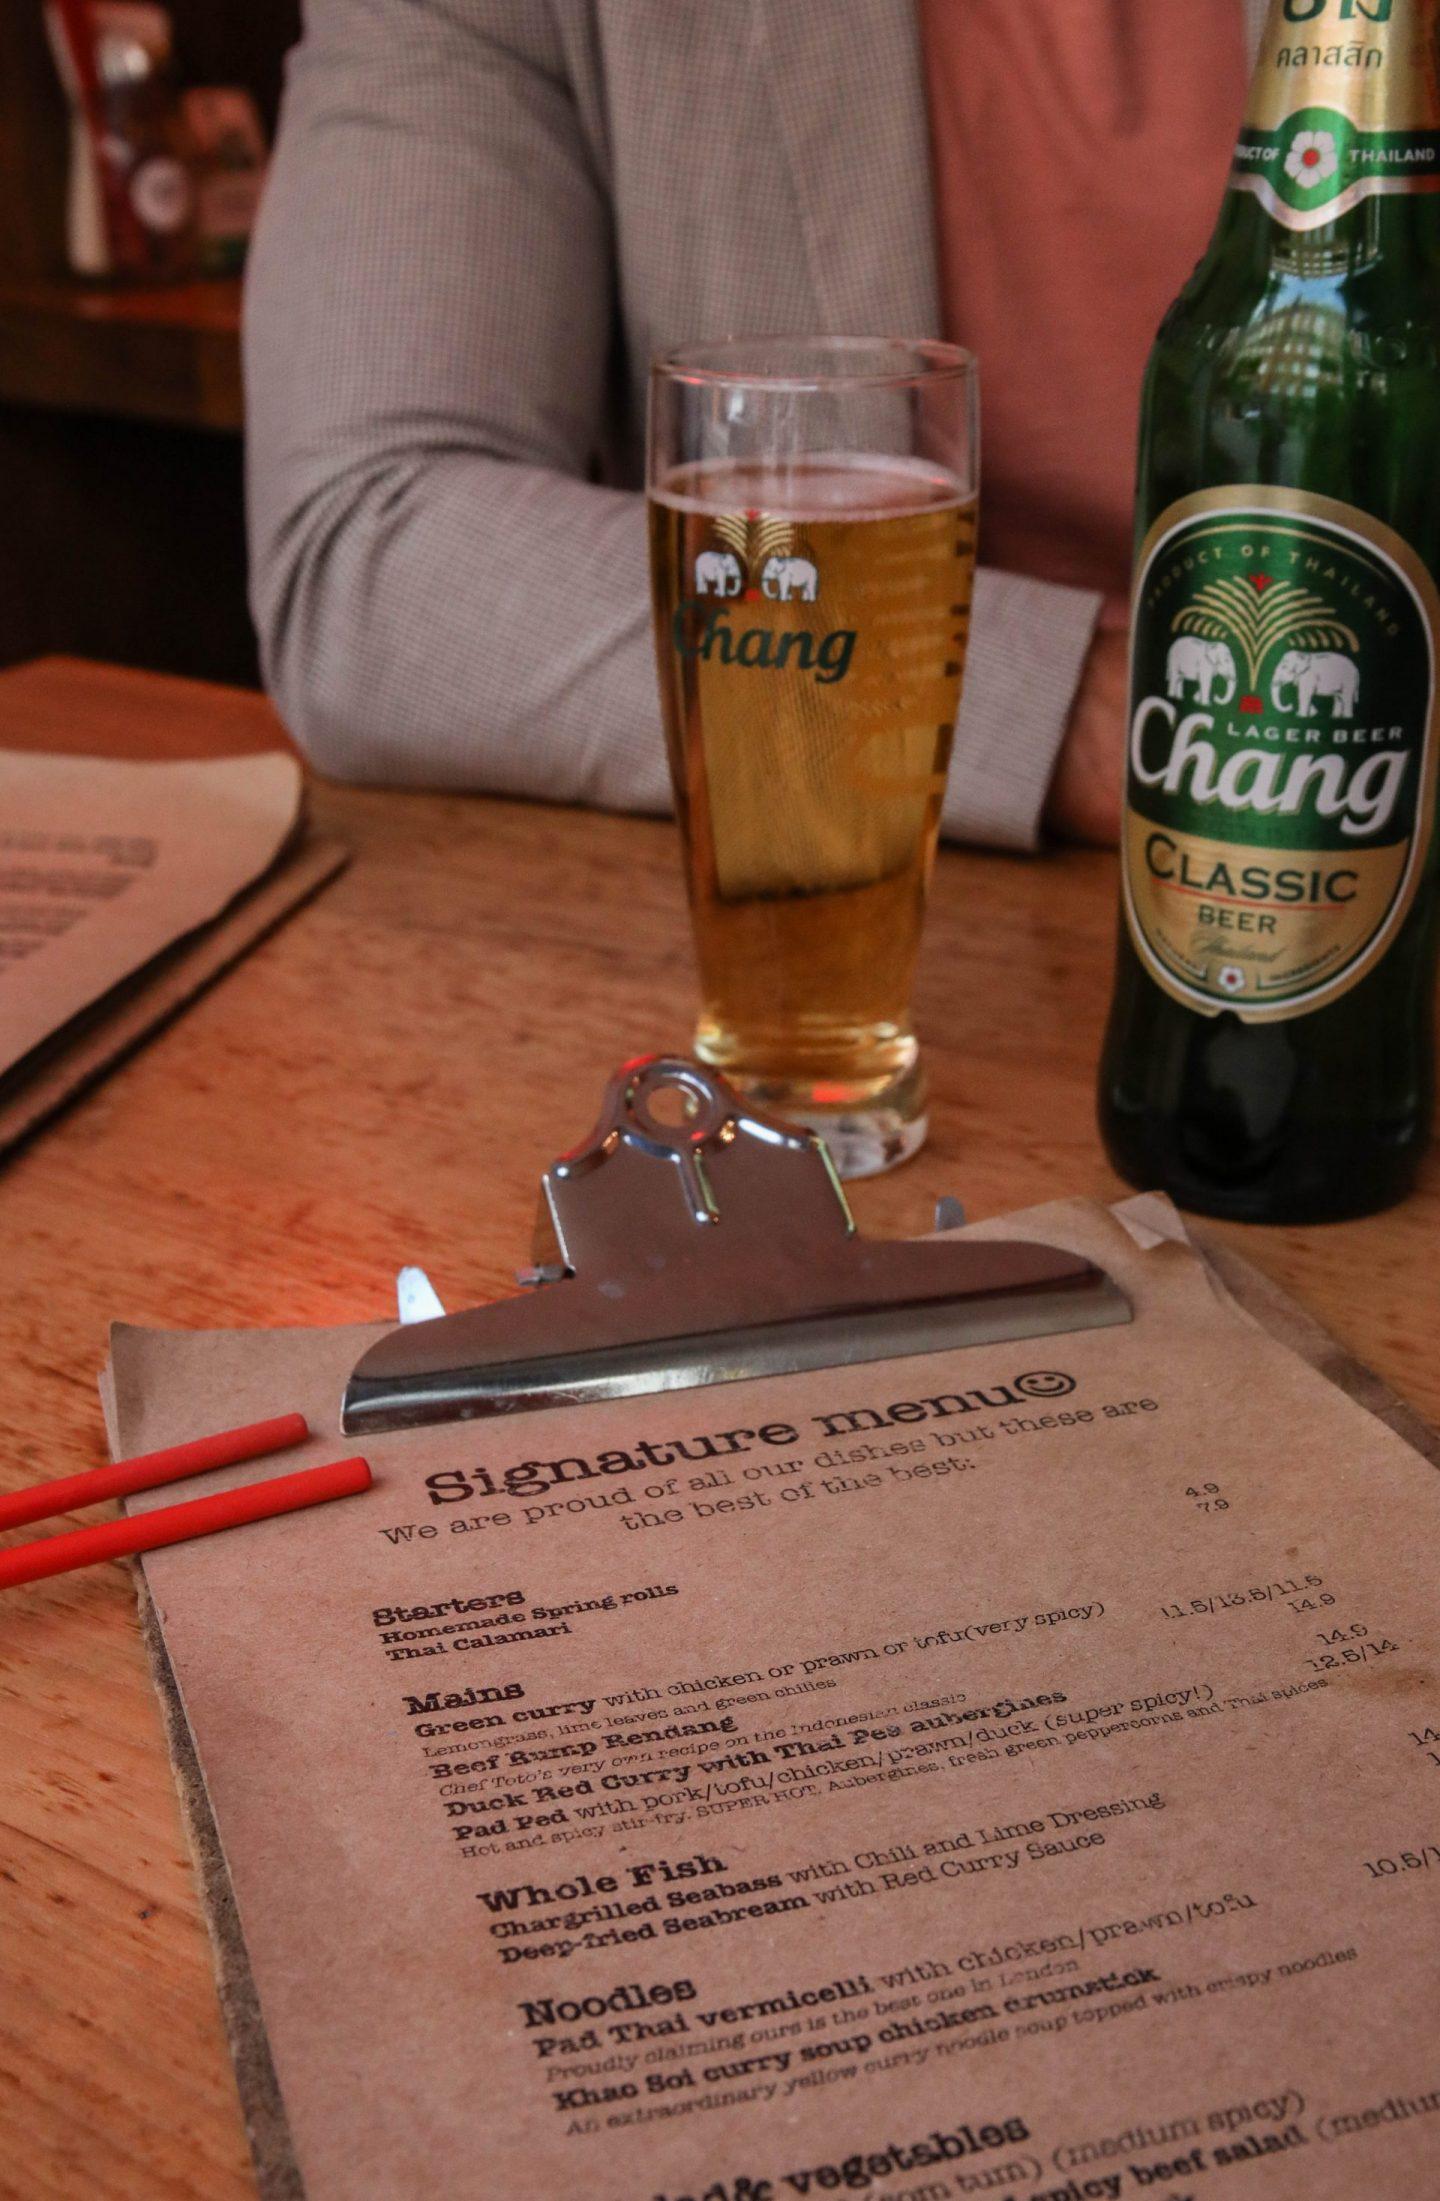 Chang Beer Sensory Trails